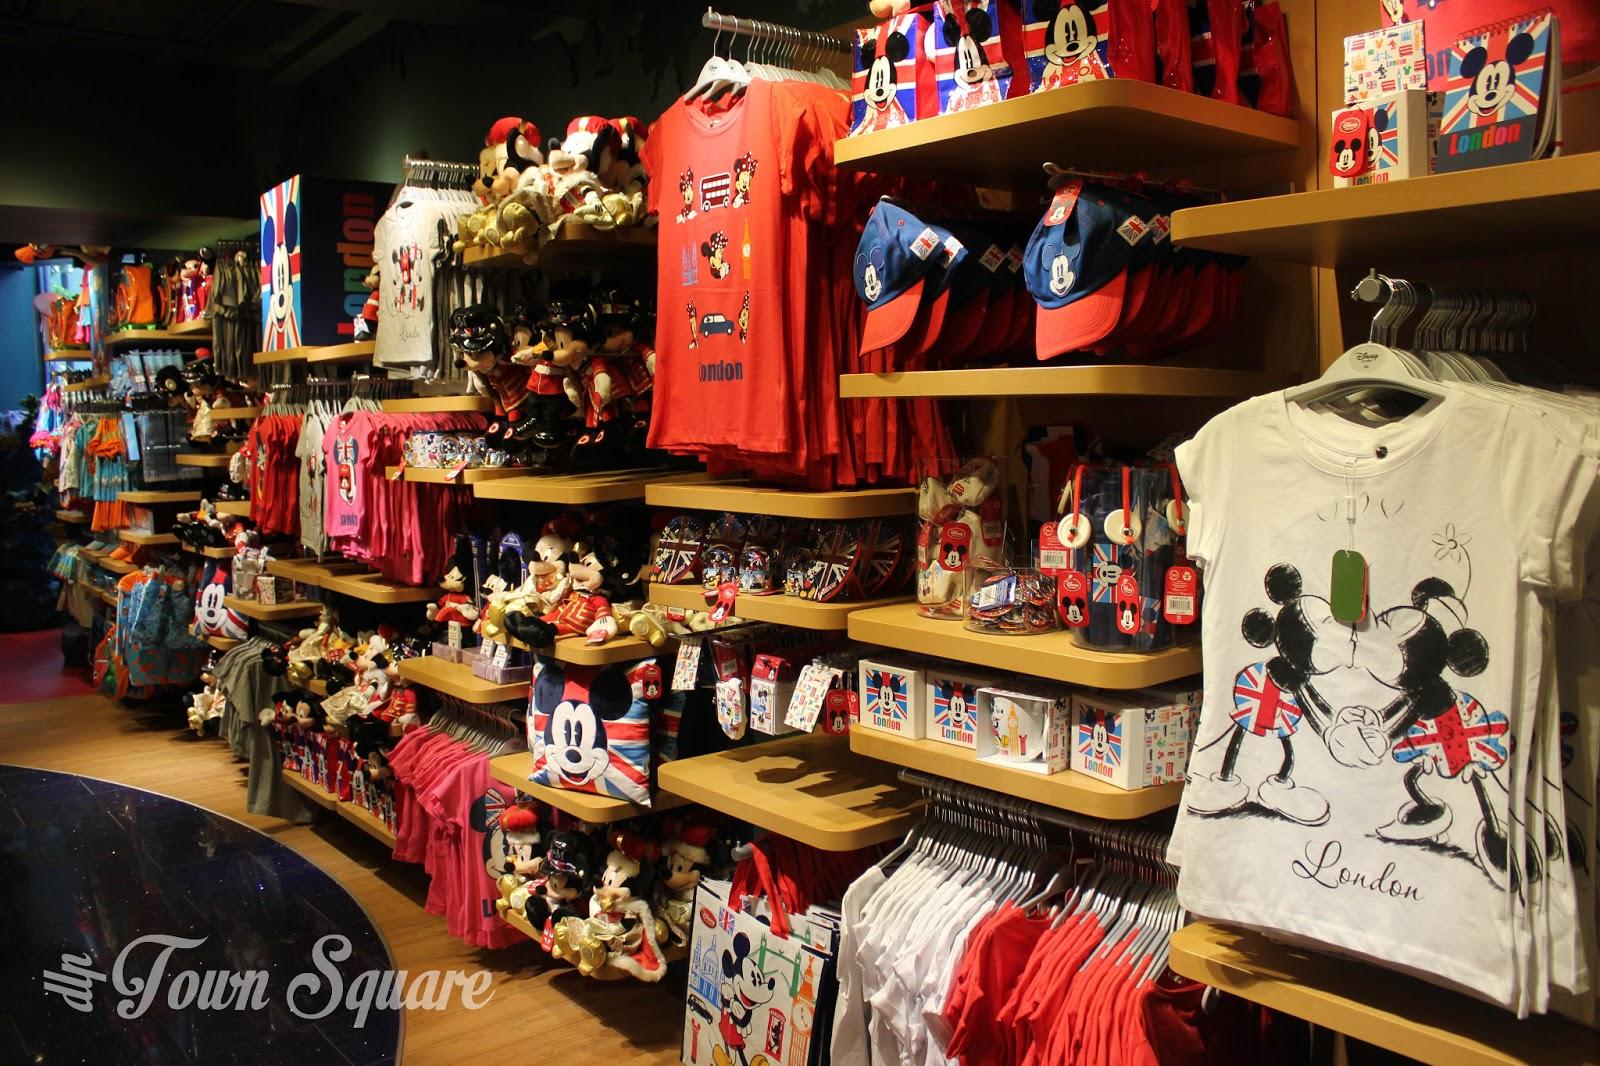 London merchandise